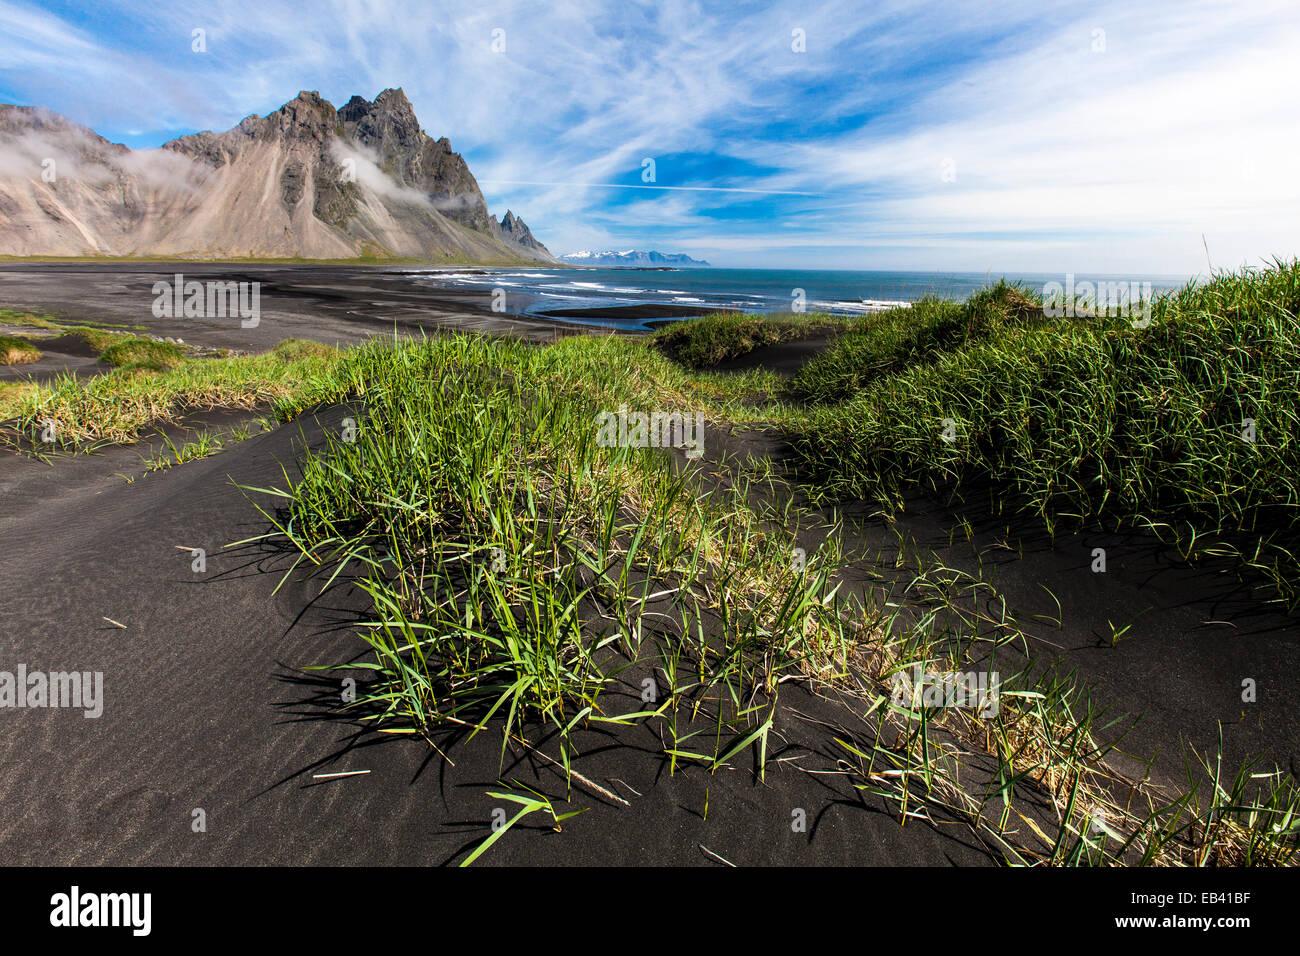 black sand beach and  mountains, Stokksnes, Iceland - Stock Image